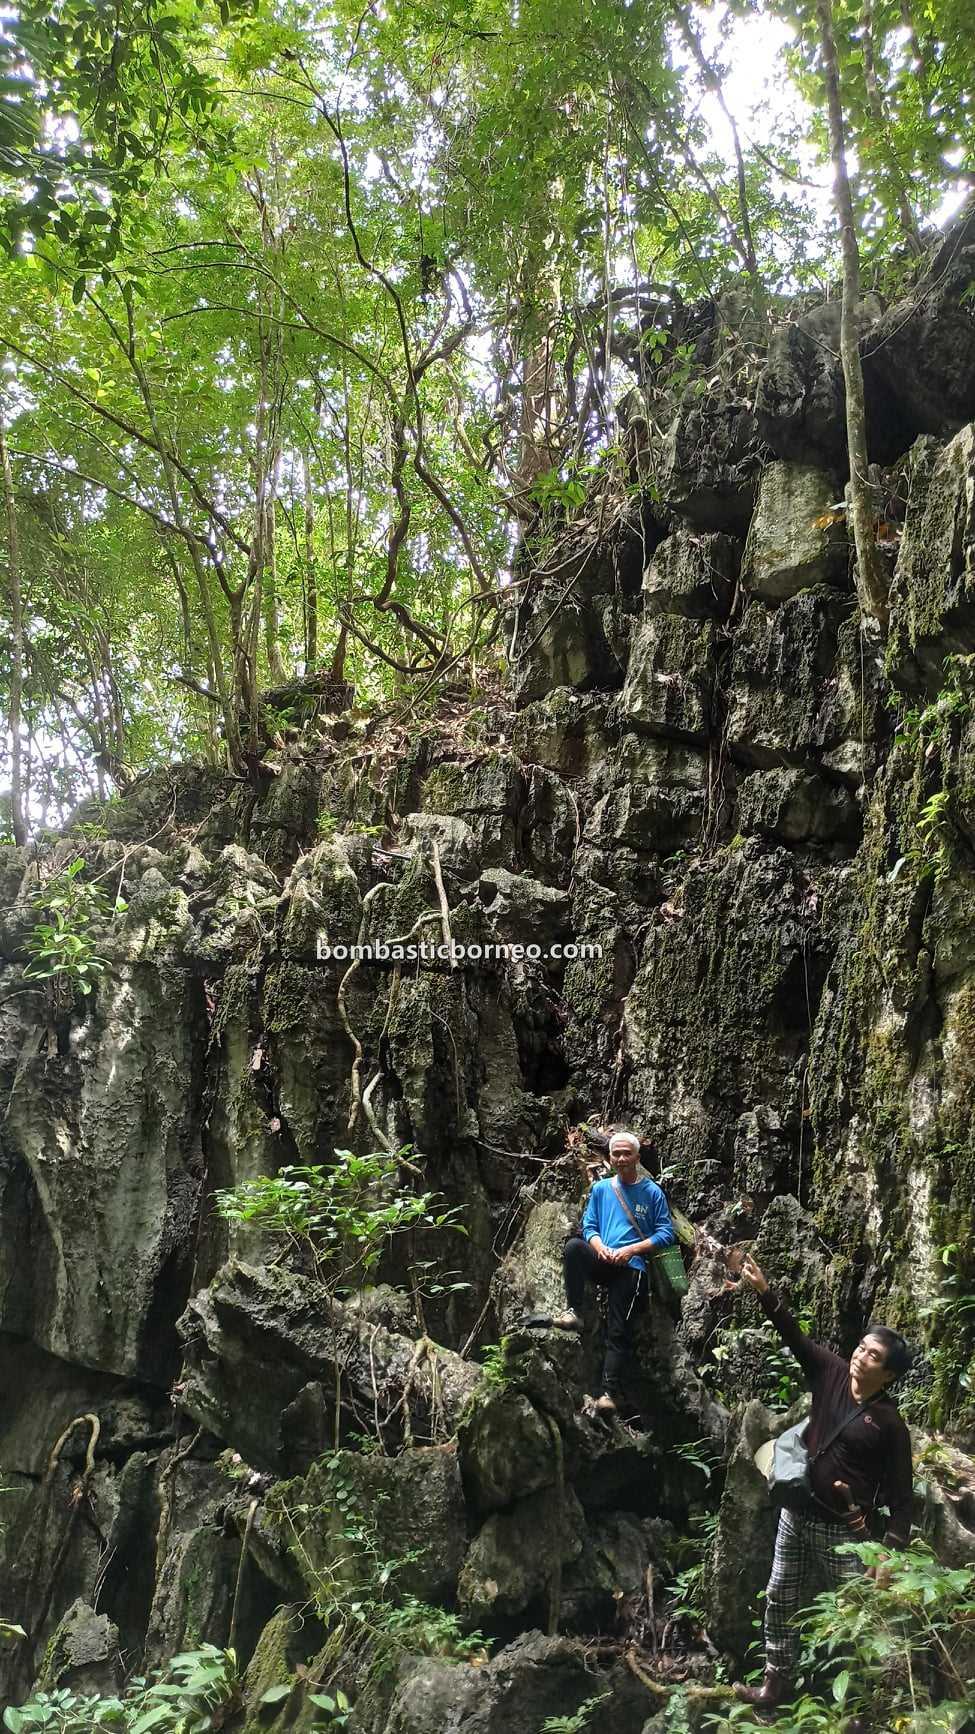 Bung Mawang, Kampung Serumah, Kampung Gayu, adventure, outdoor, jungle trekking, exploration, Kuching, Malaysia, tourist attraction, travel local, Borneo, 探索婆罗洲热带雨林, 砂拉越自然生态, 古晋丛林徒步